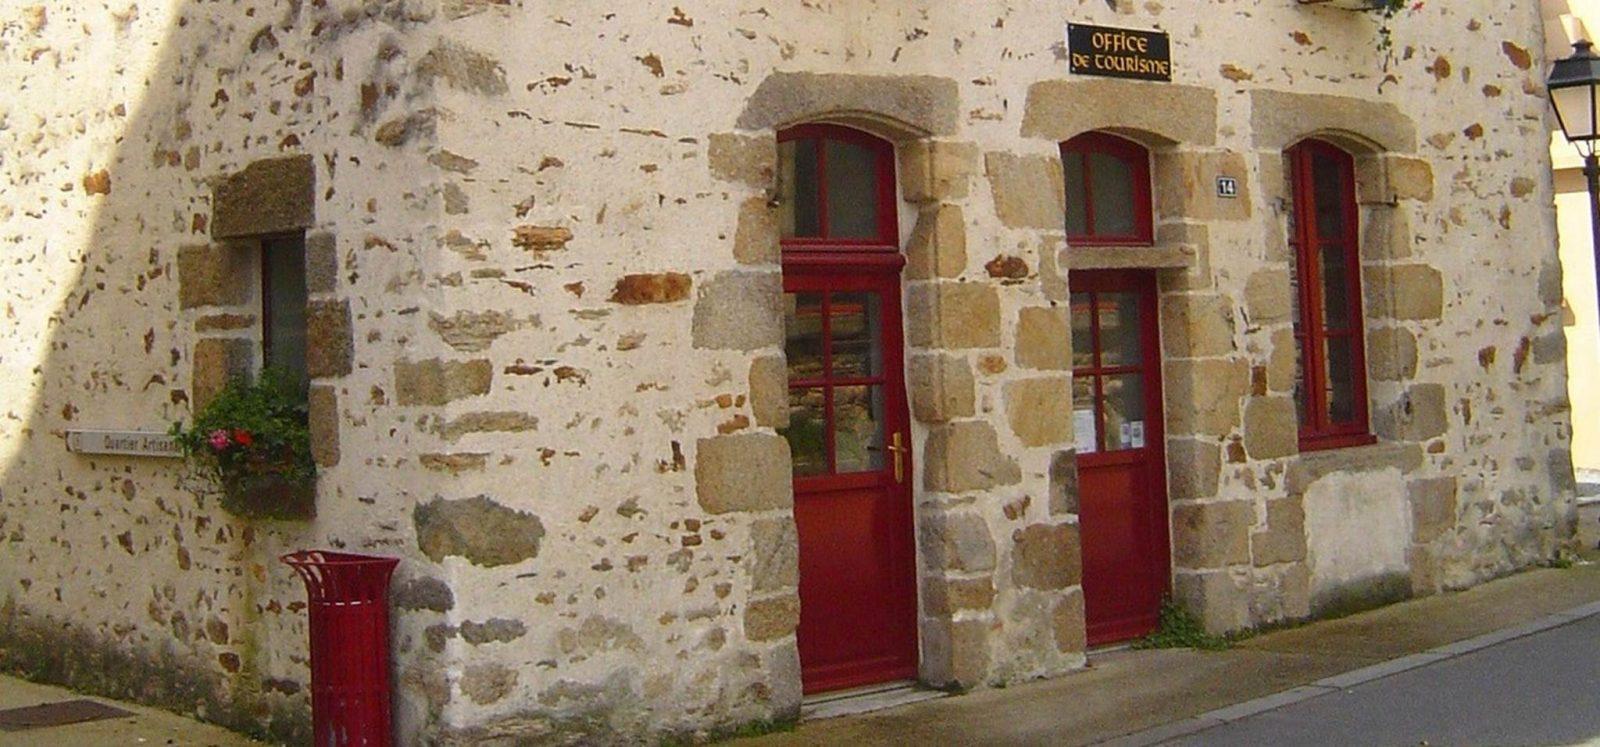 Office de Tourisme – La Roche-Bernard